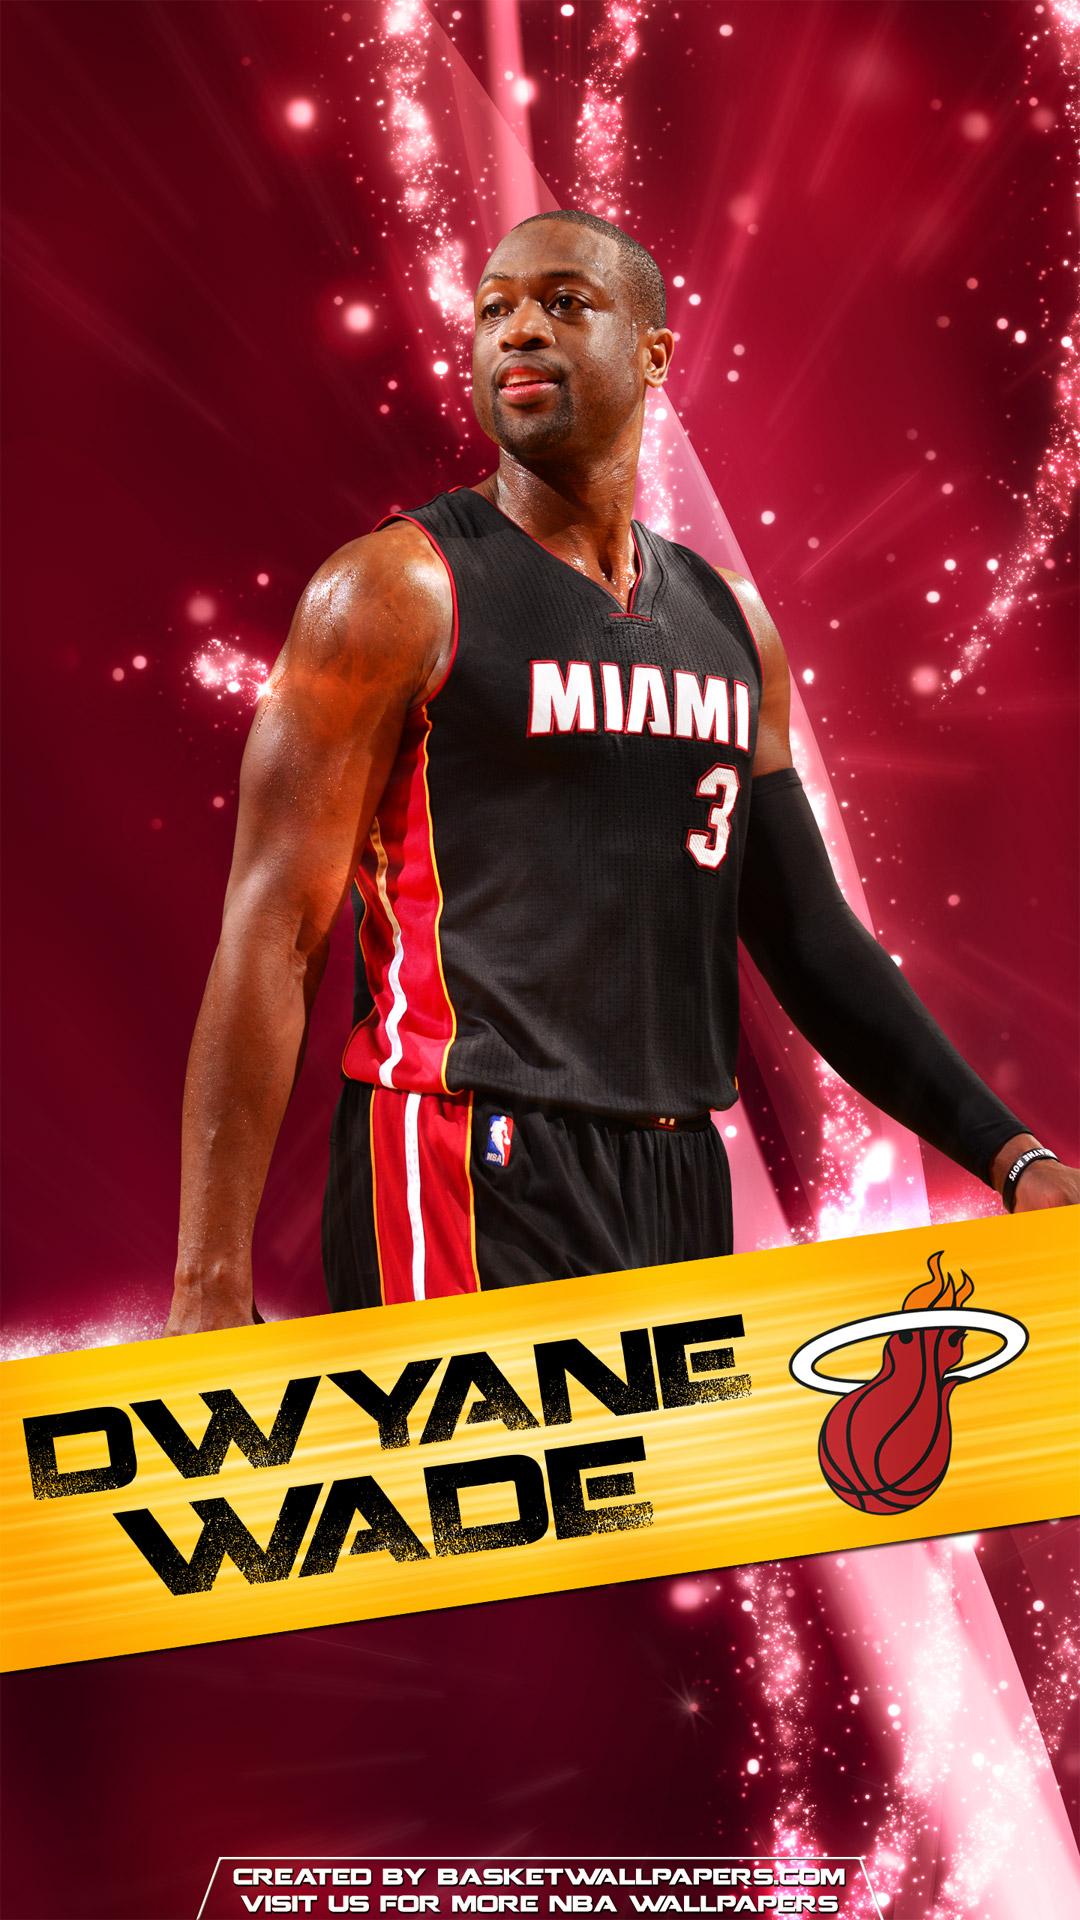 Dwyane Wade Miami Heat 2016 Mobile Wallpaper Basketball Wallpapers 1080x1920